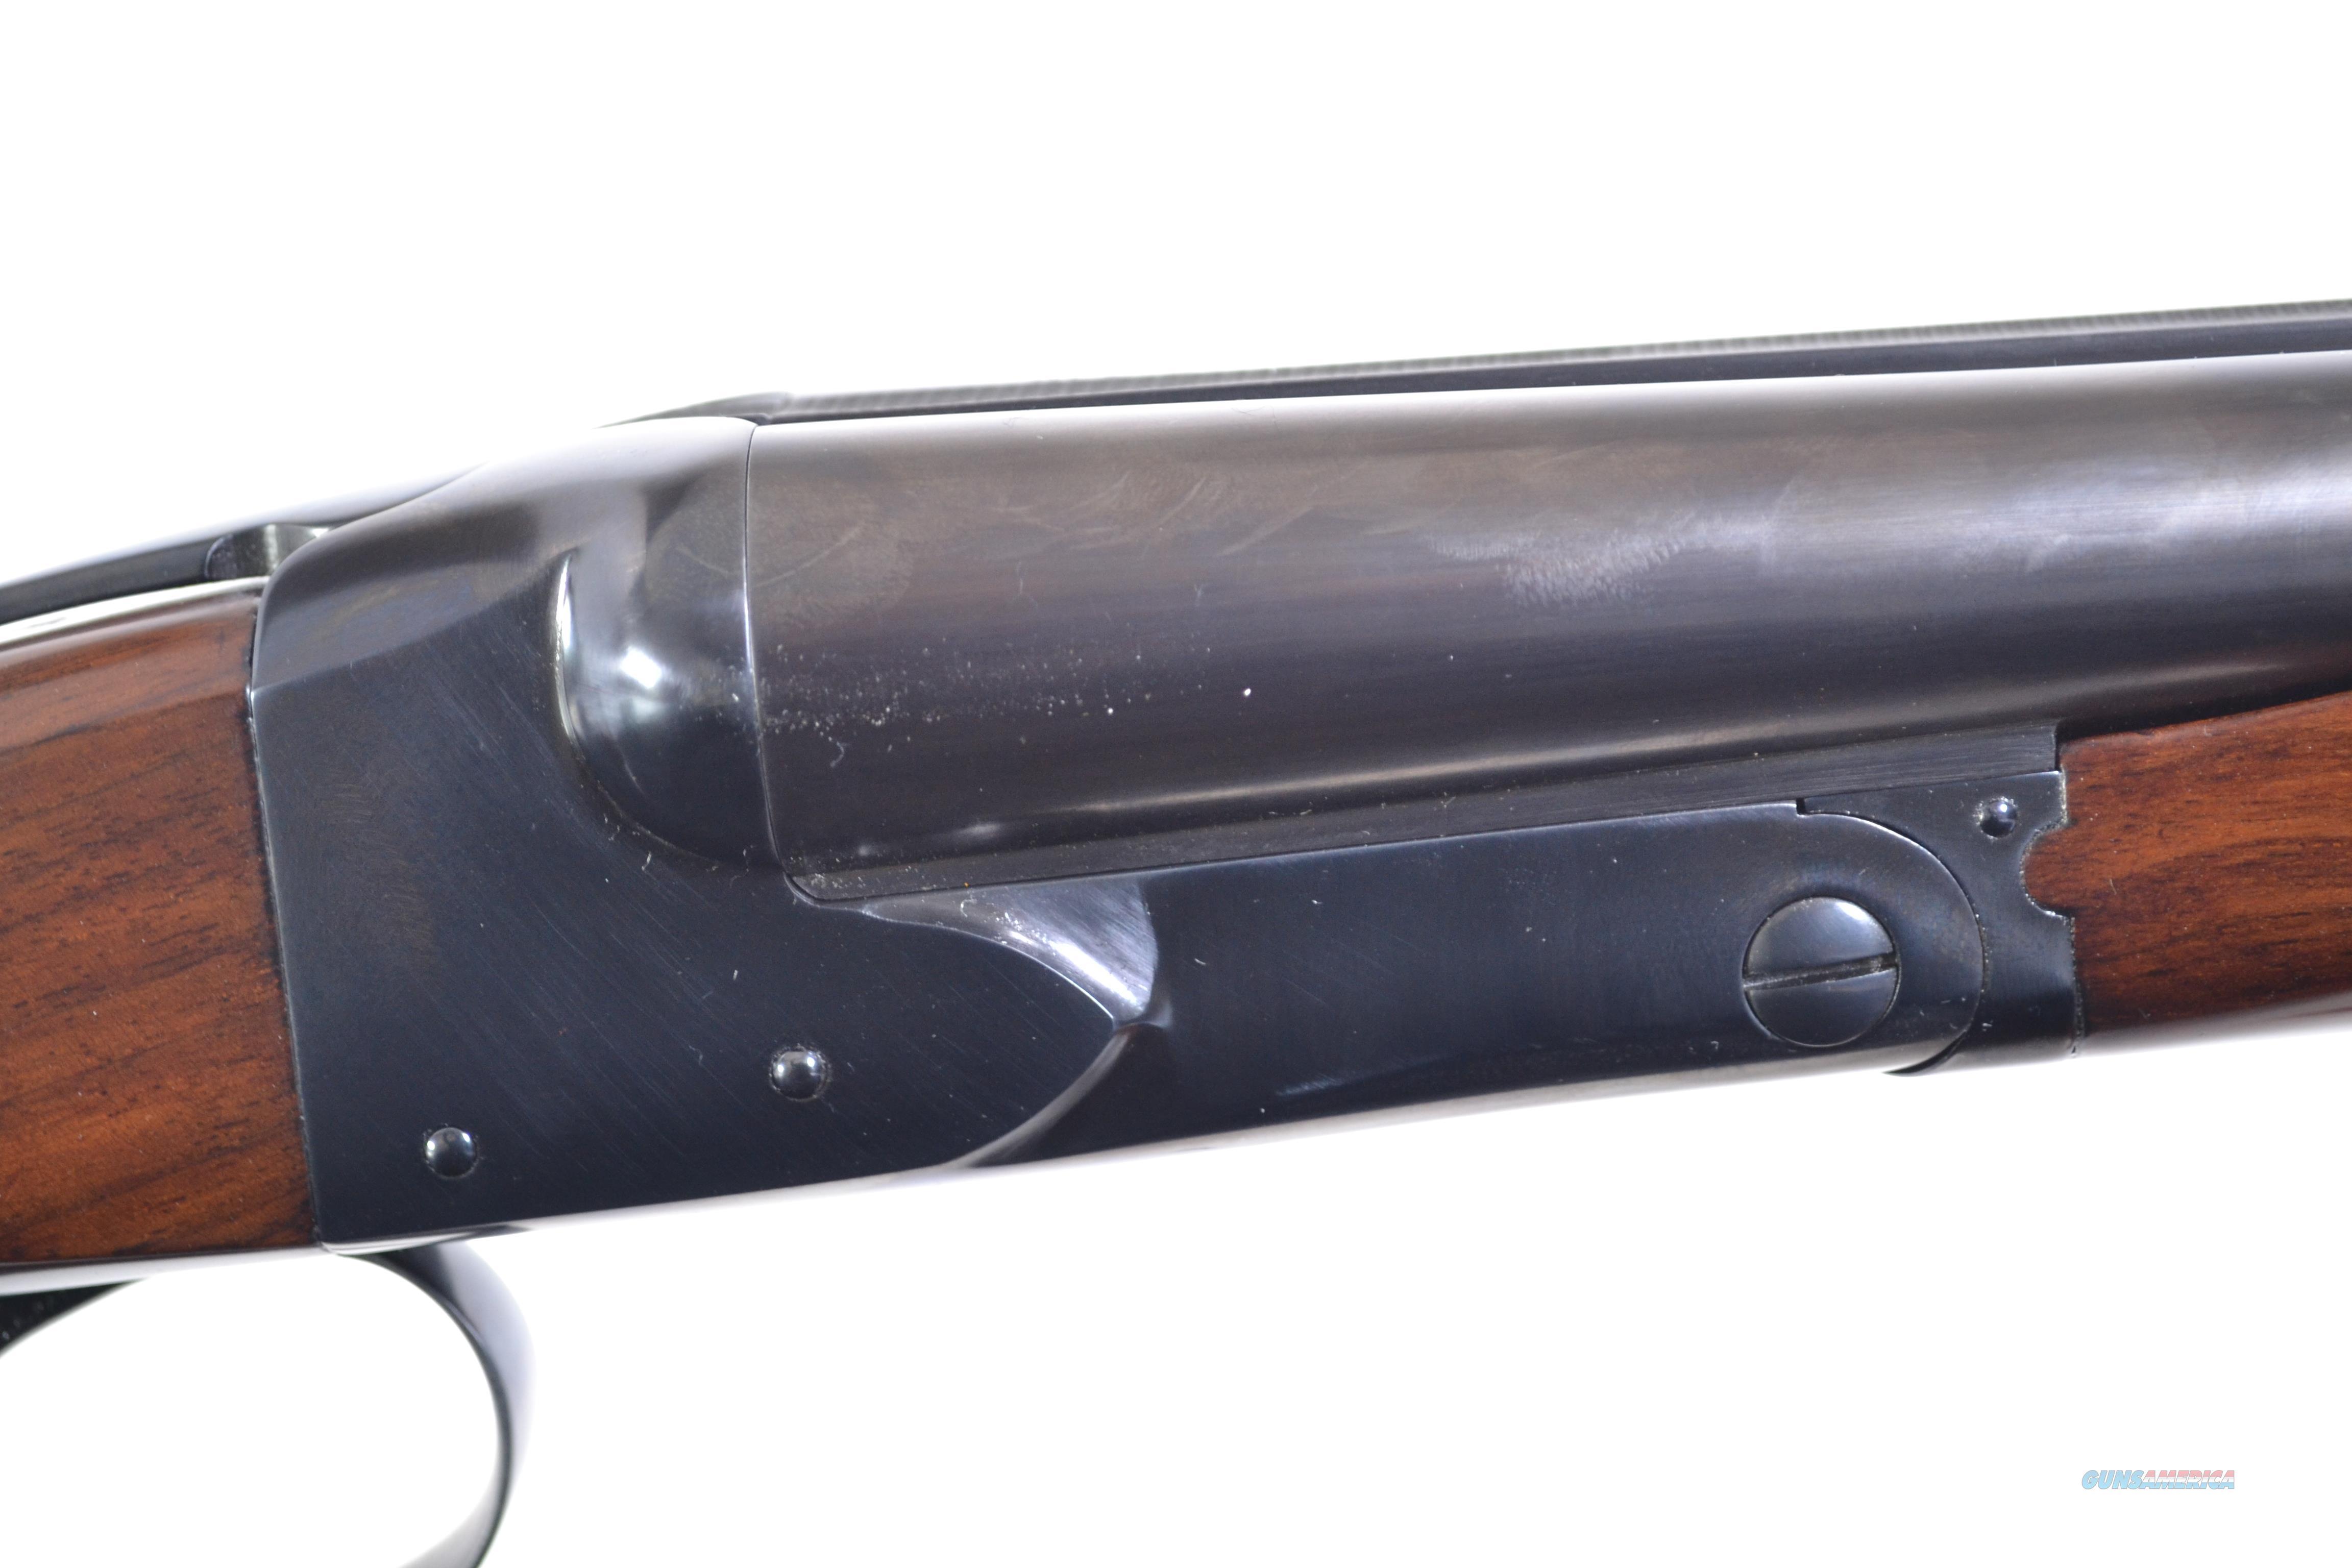 "Winchester - Model 21 Tournament Grade 12ga. 2 barrel set, 26"" WS1/WS2, 30"" M/F  Guns > Shotguns > Winchester Shotguns - Modern > SxS"